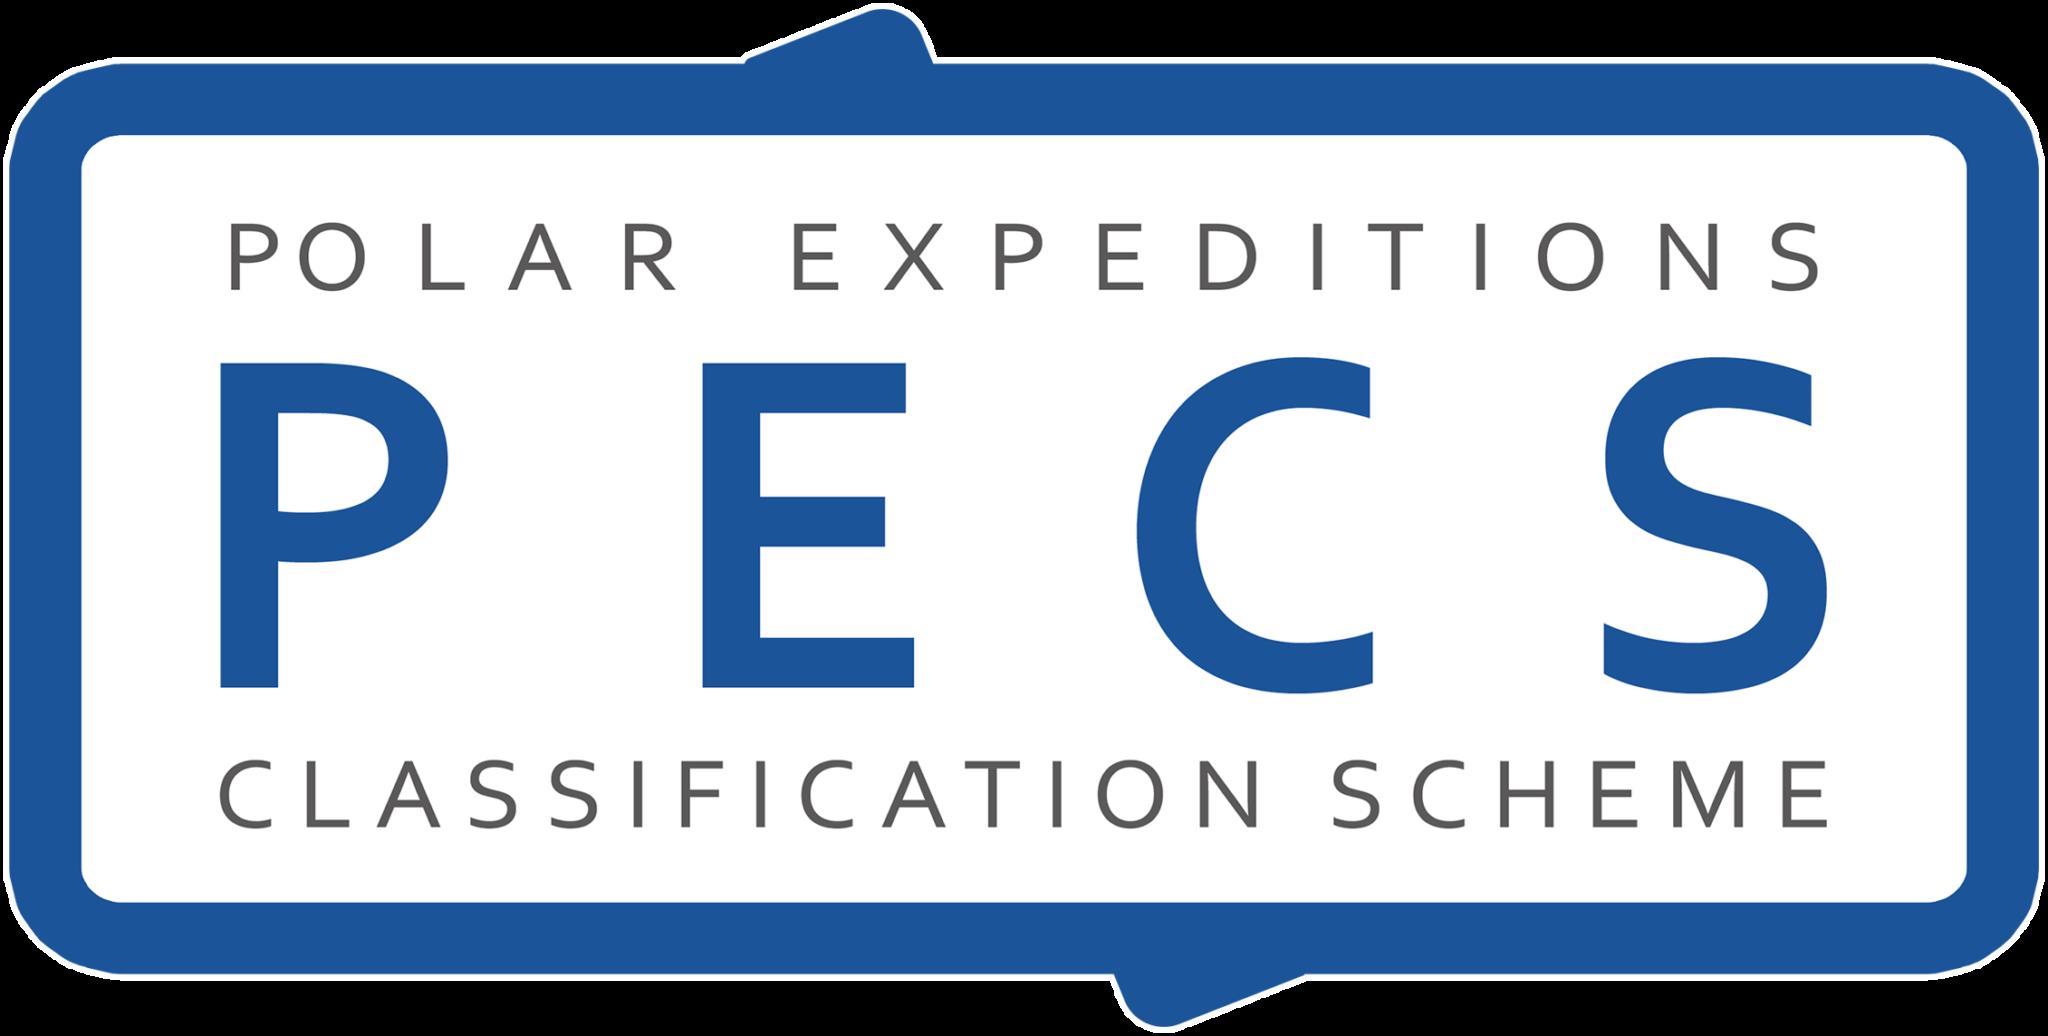 PECS - Polar Expeditions Classification Scheme